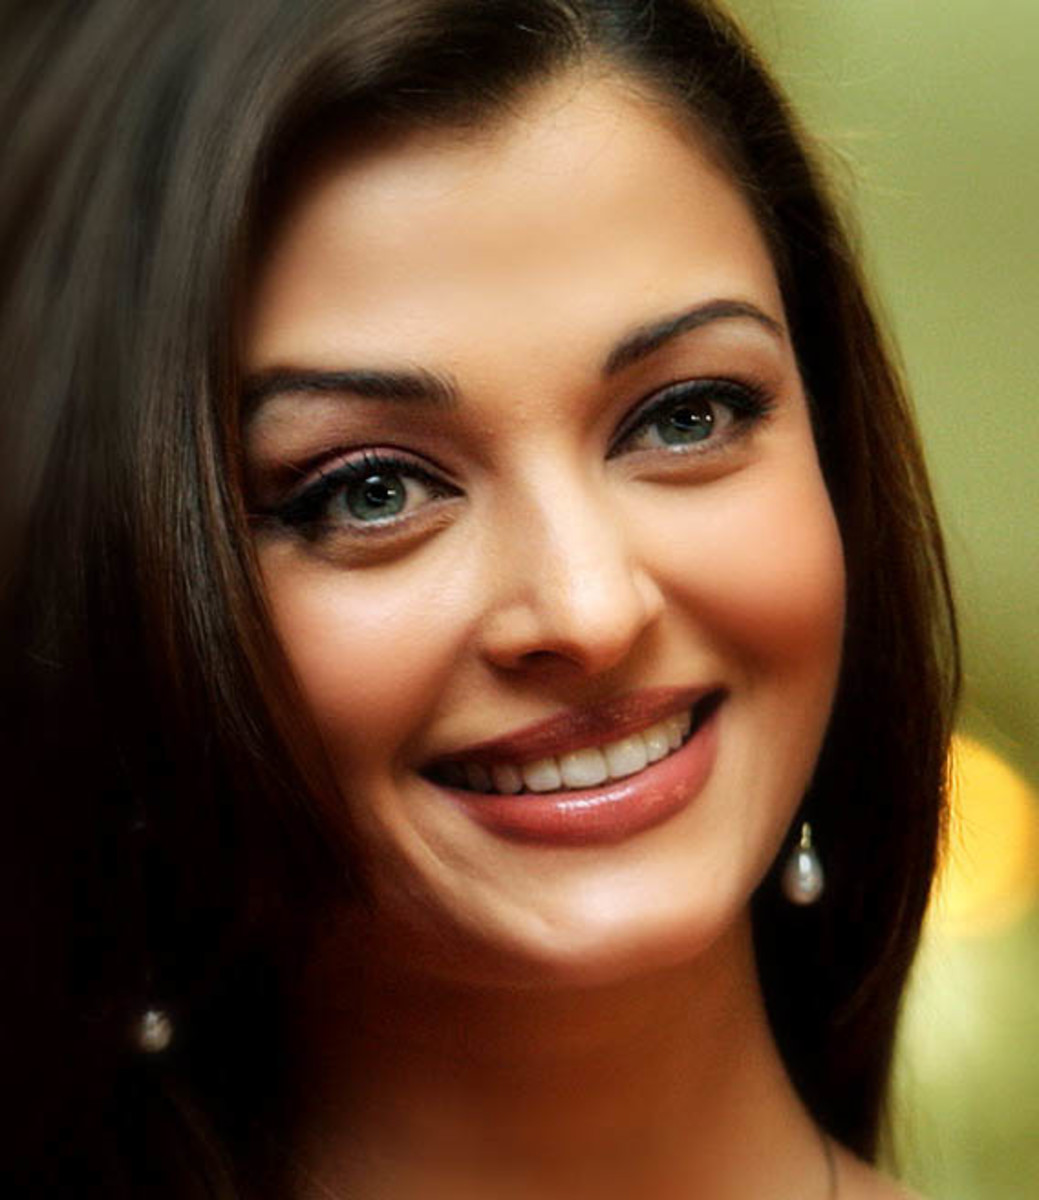 Unseen Aishwarya Rai Photos And Videos!